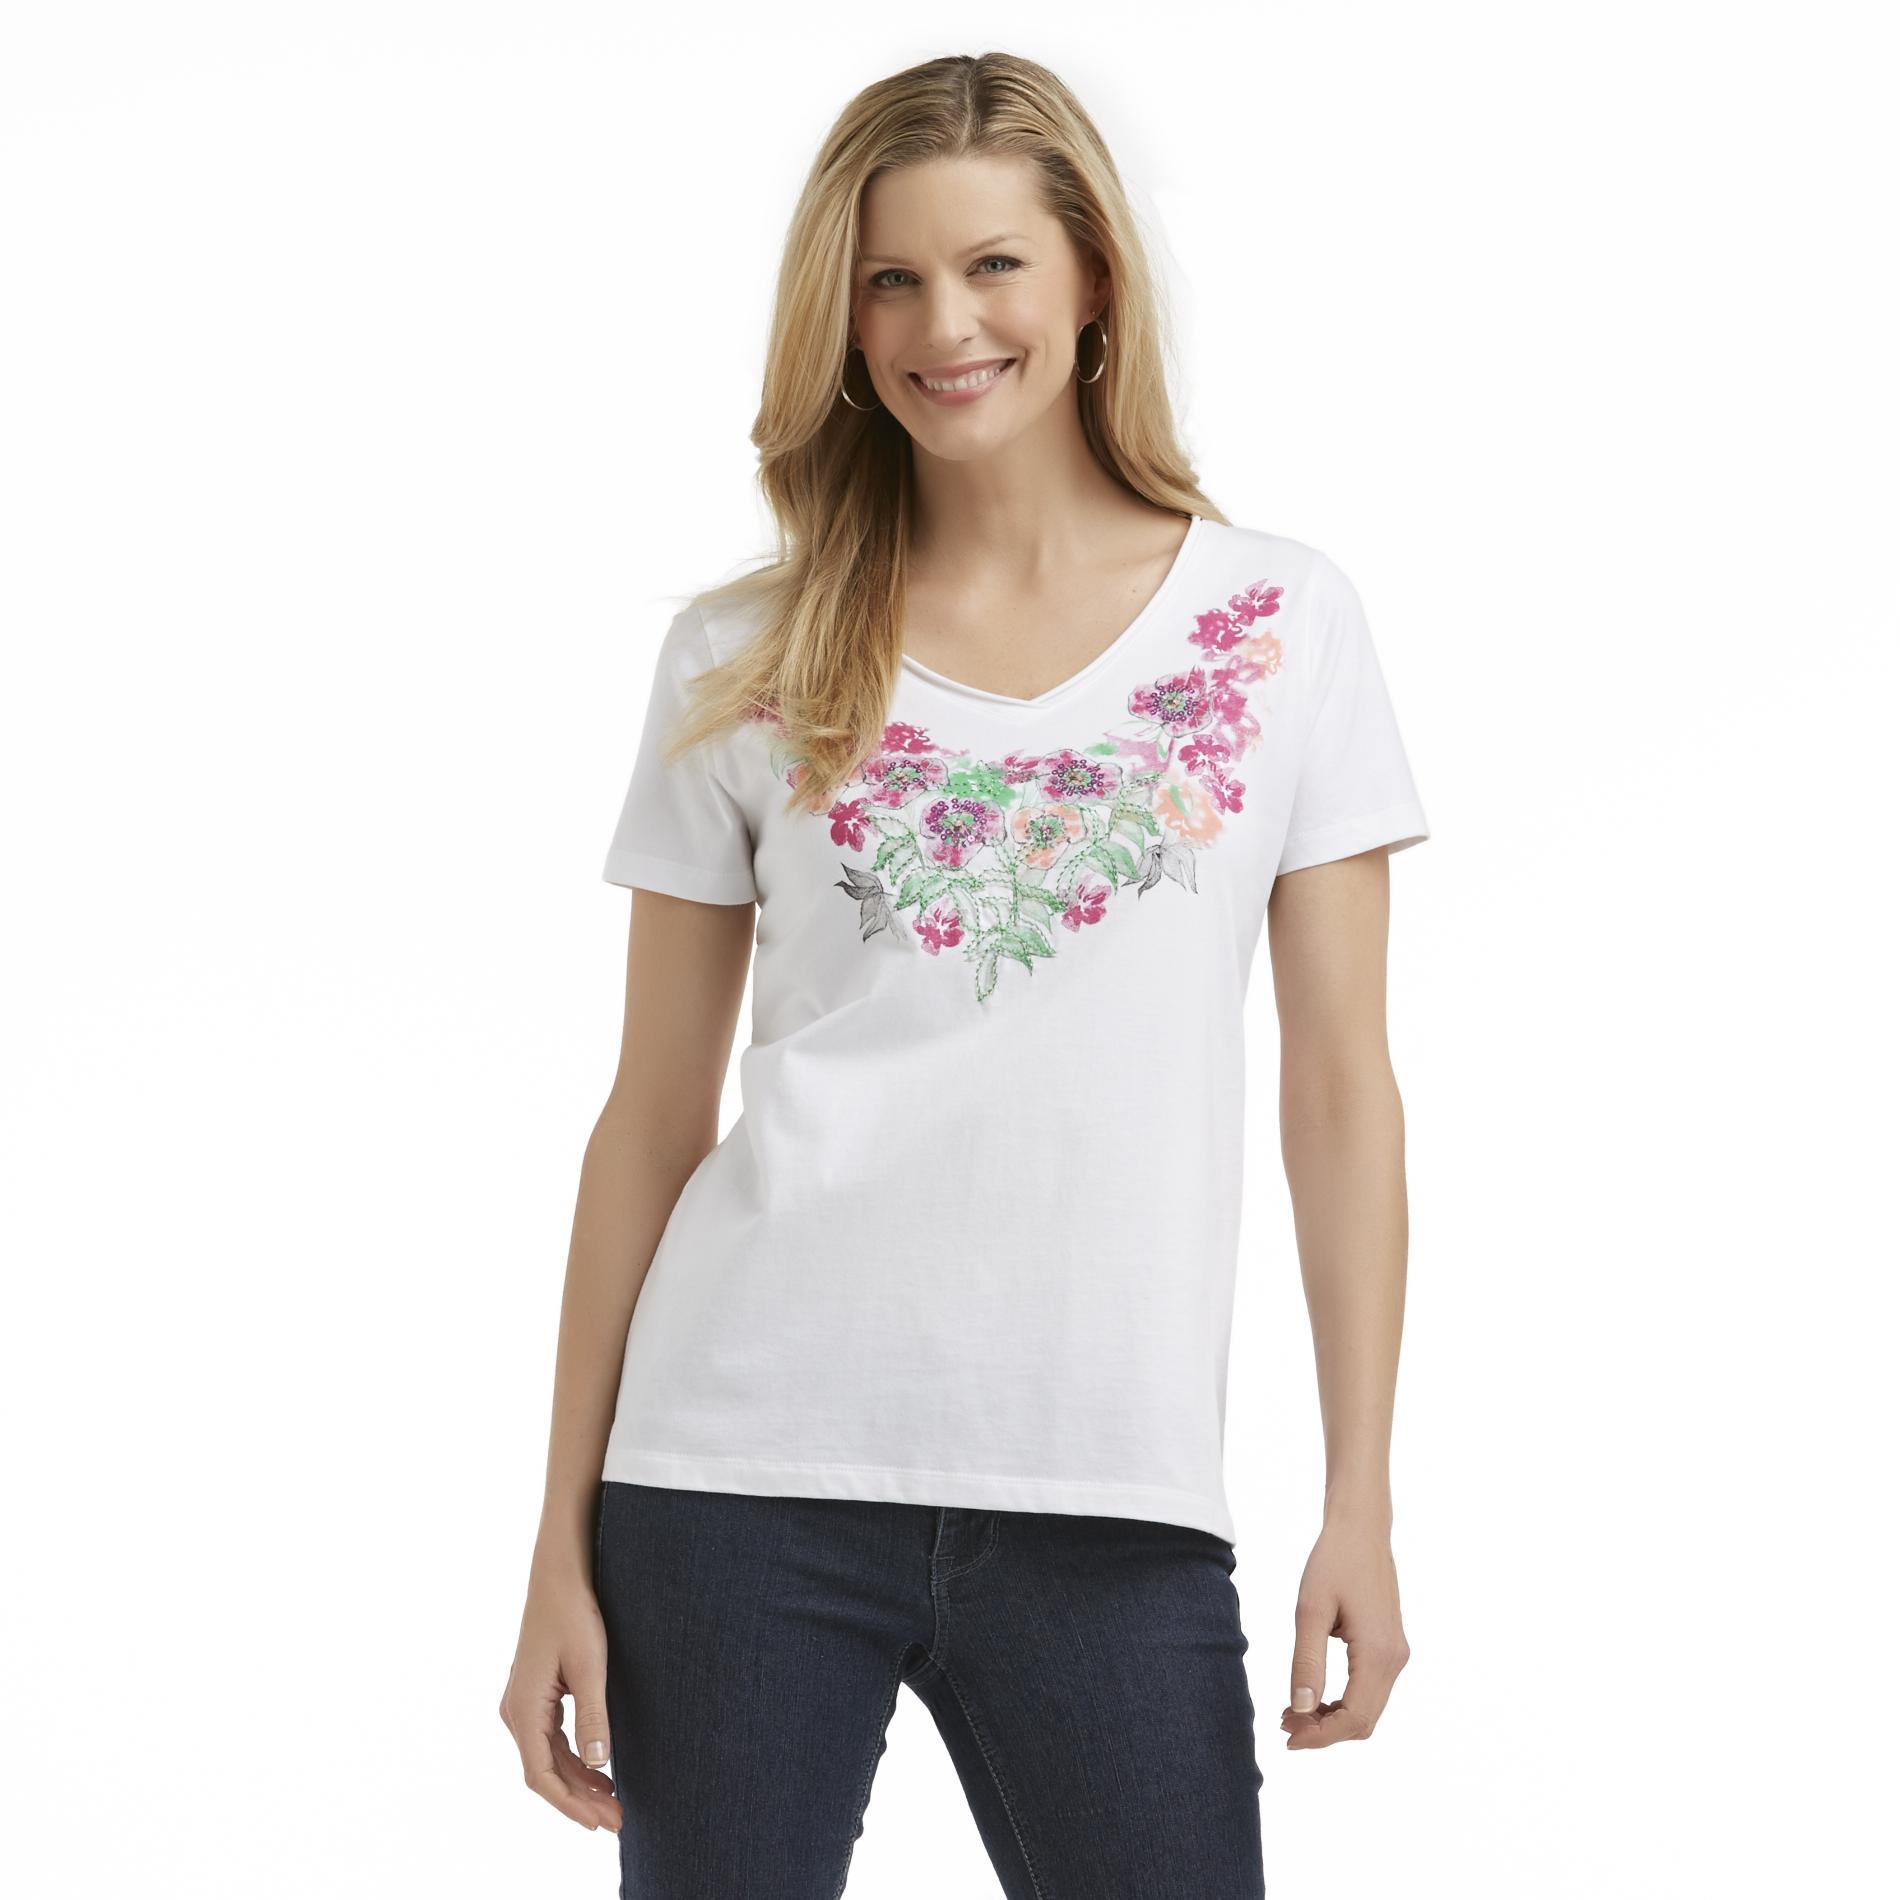 Laura Scott Women's V-Neck T-Shirt - Floral at Sears.com